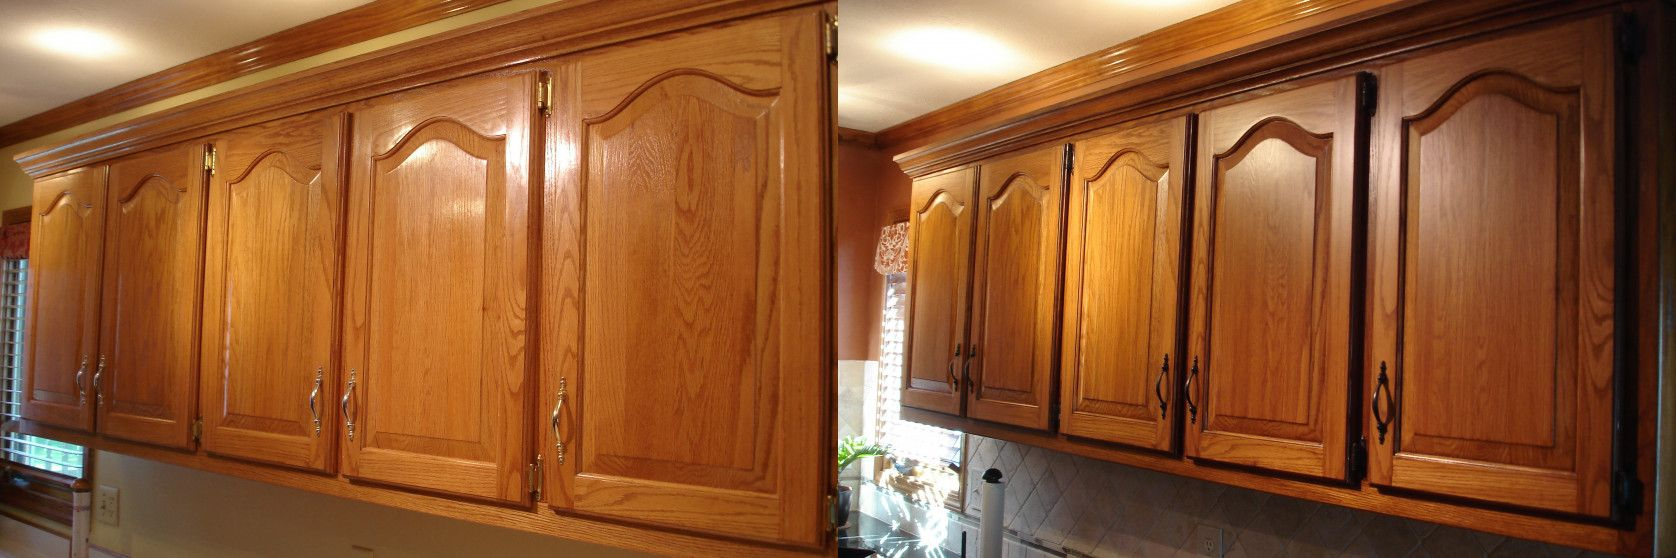 70+ Glazing Oak Cabinets before after - Kitchen Nook ...